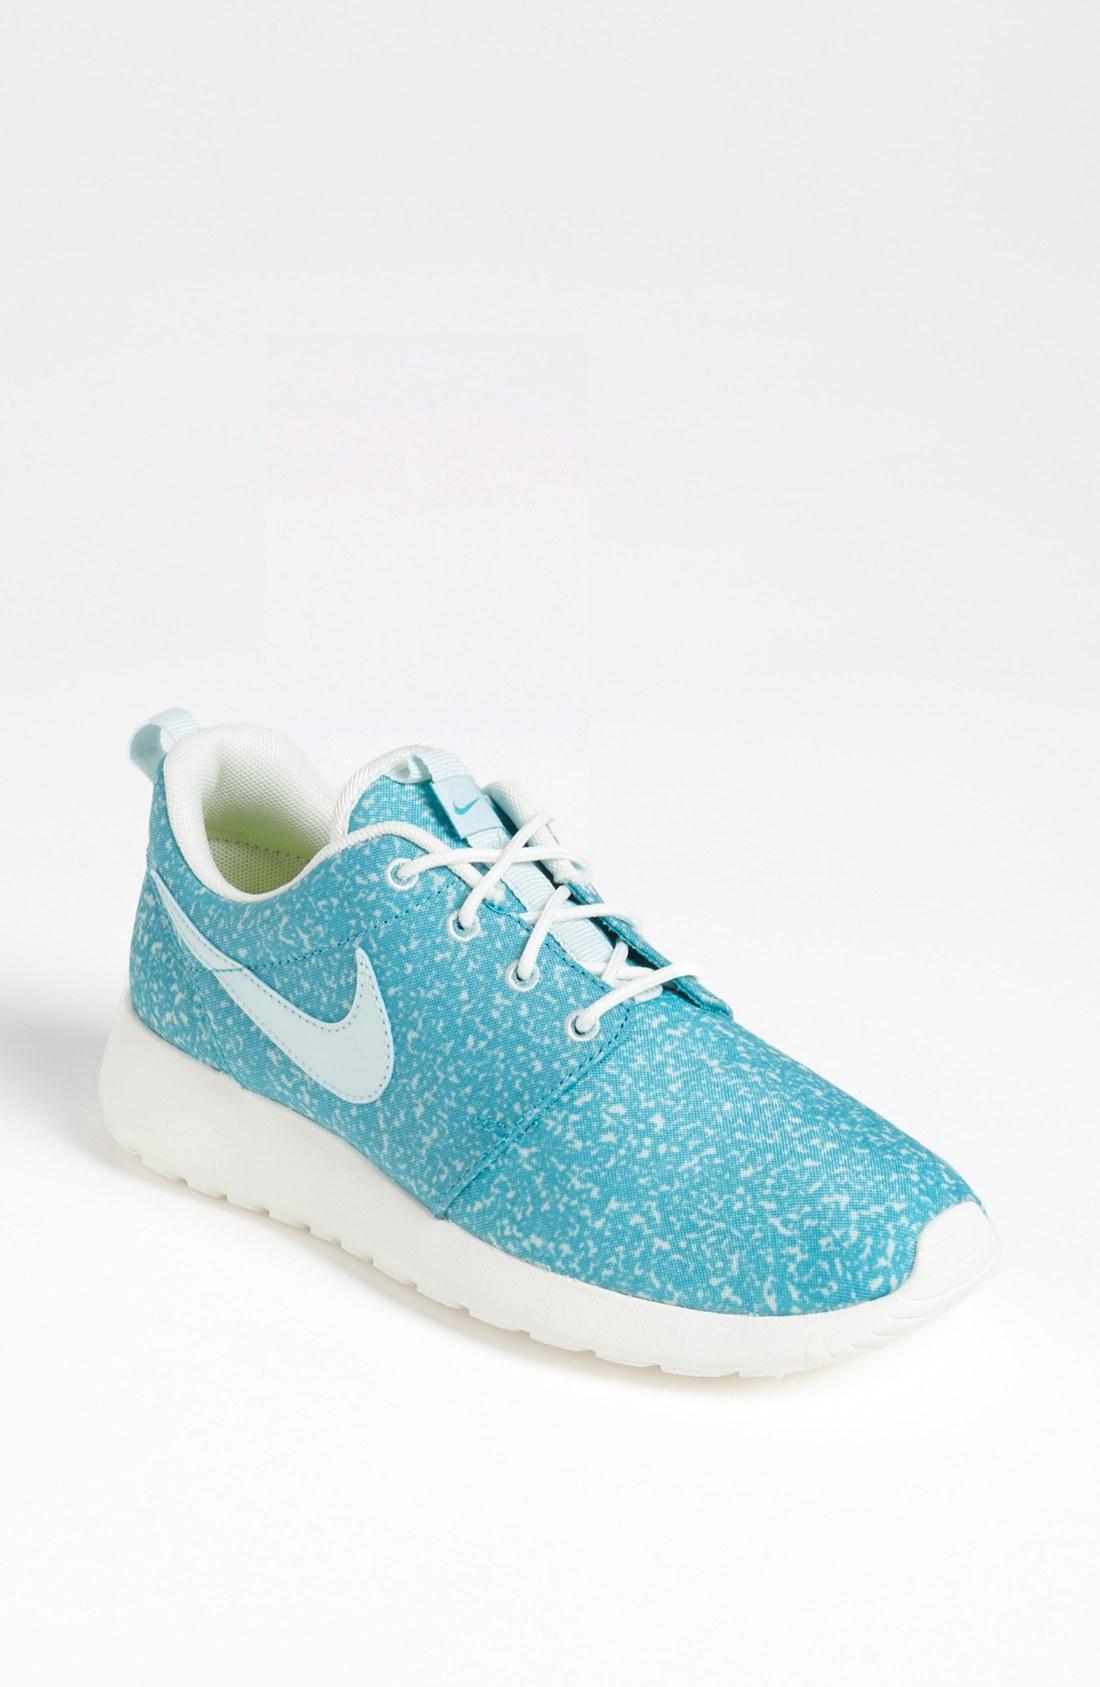 nike roshe run sneaker in blue light blue lyst. Black Bedroom Furniture Sets. Home Design Ideas